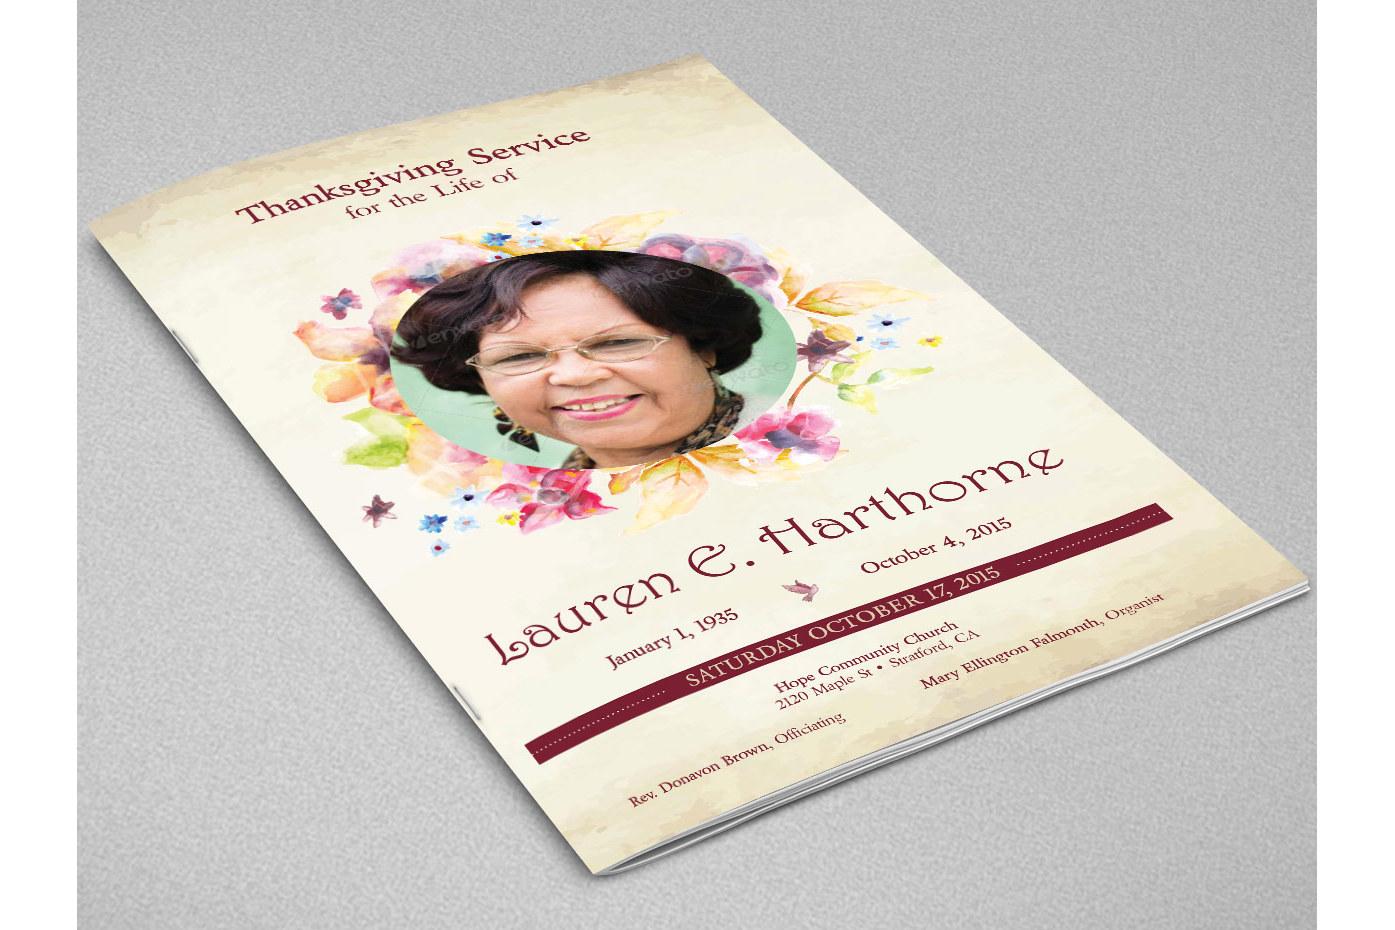 Watercolor Funeral Program Indesign Tem Design Bundles - Funeral flyer template